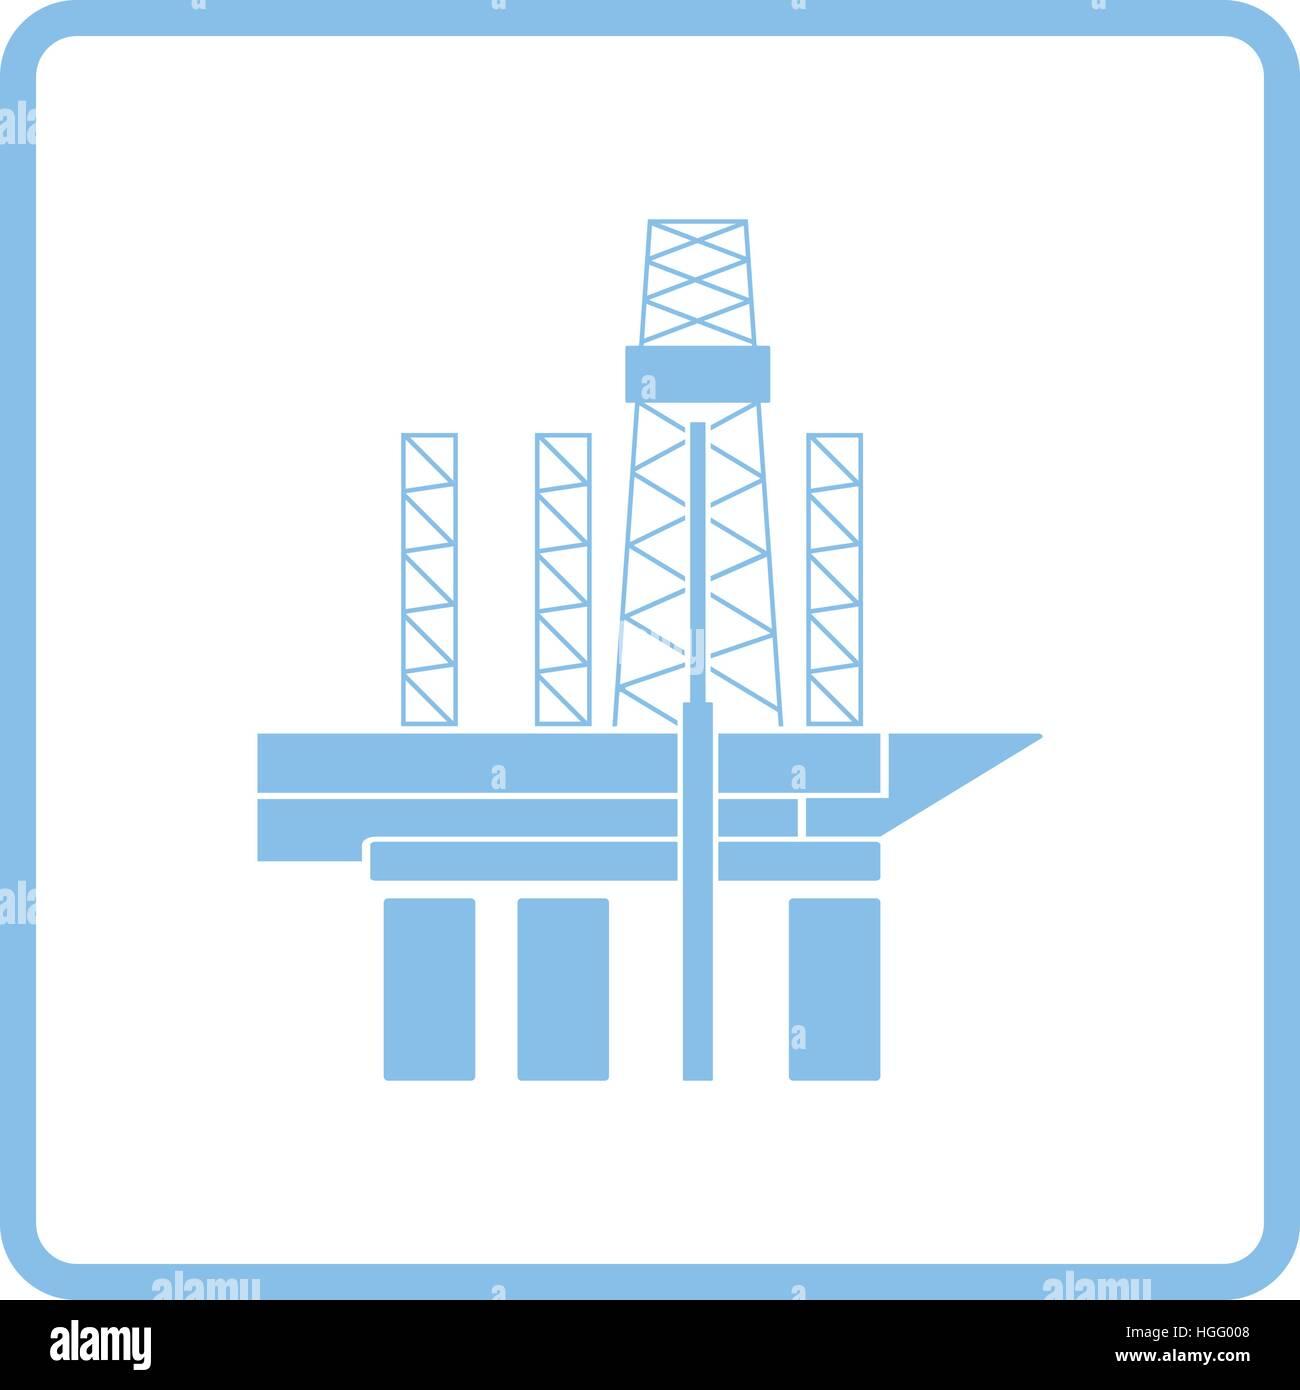 Öl-Meer-Plattform-Symbol. Blauer Rahmen-Design. Vektor-Illustration ...